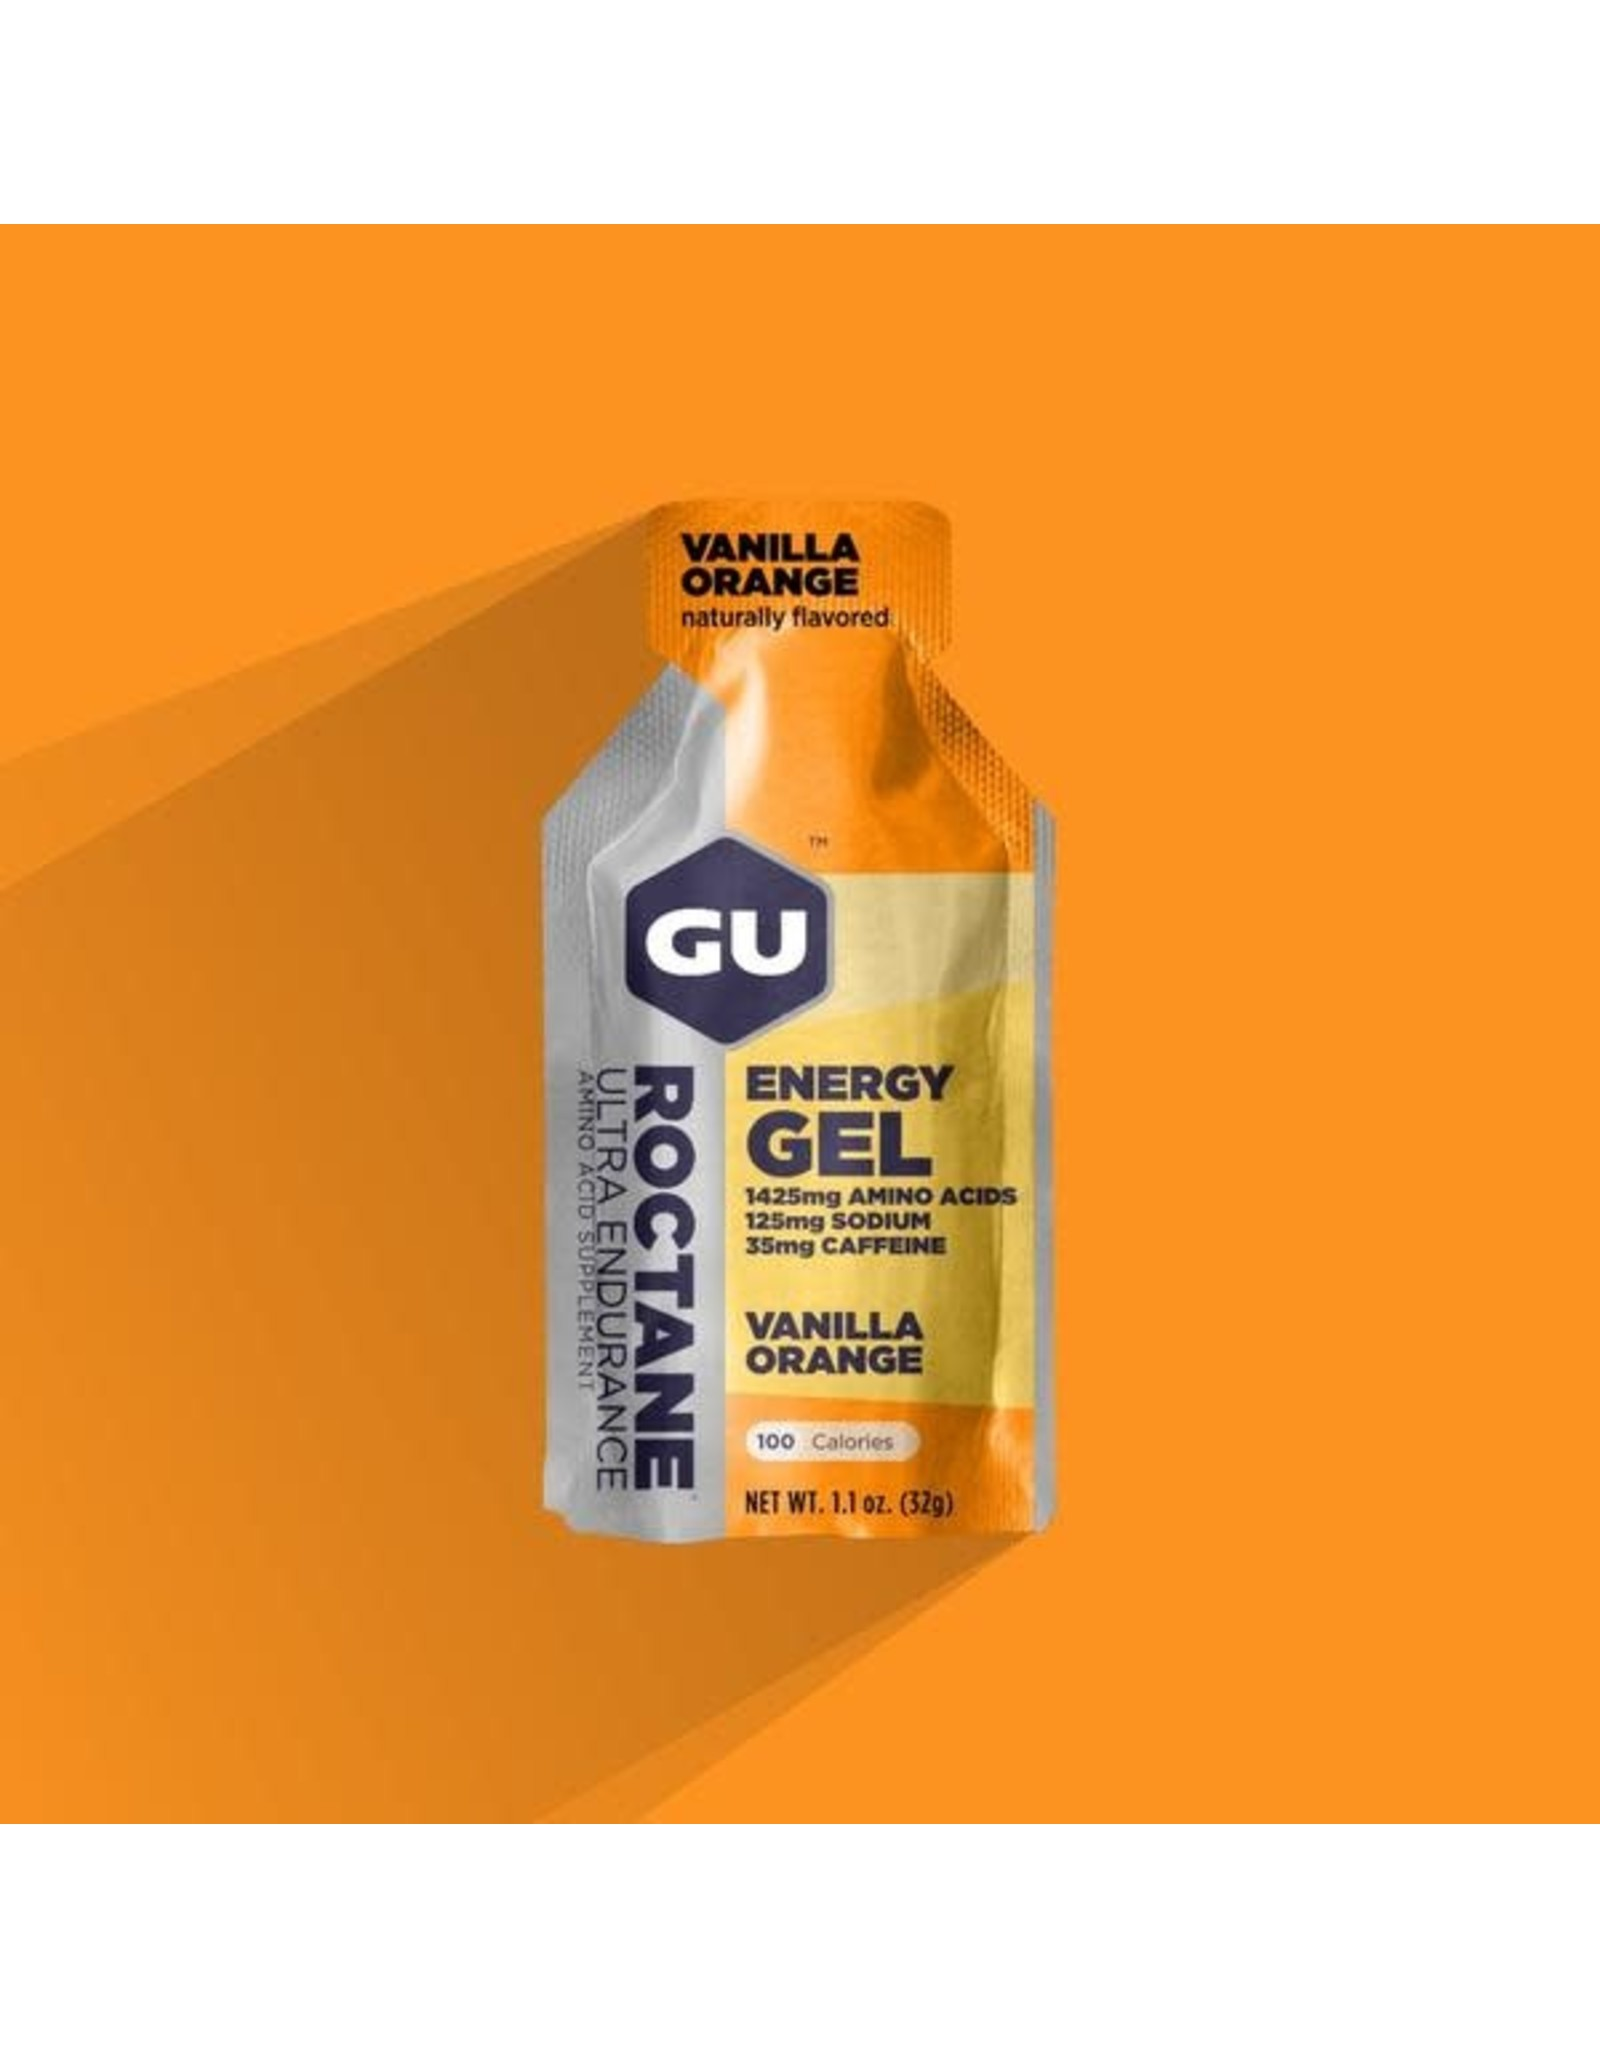 GU Energy Labs GU, Roctane Gel, Vanilla-Orange, Single